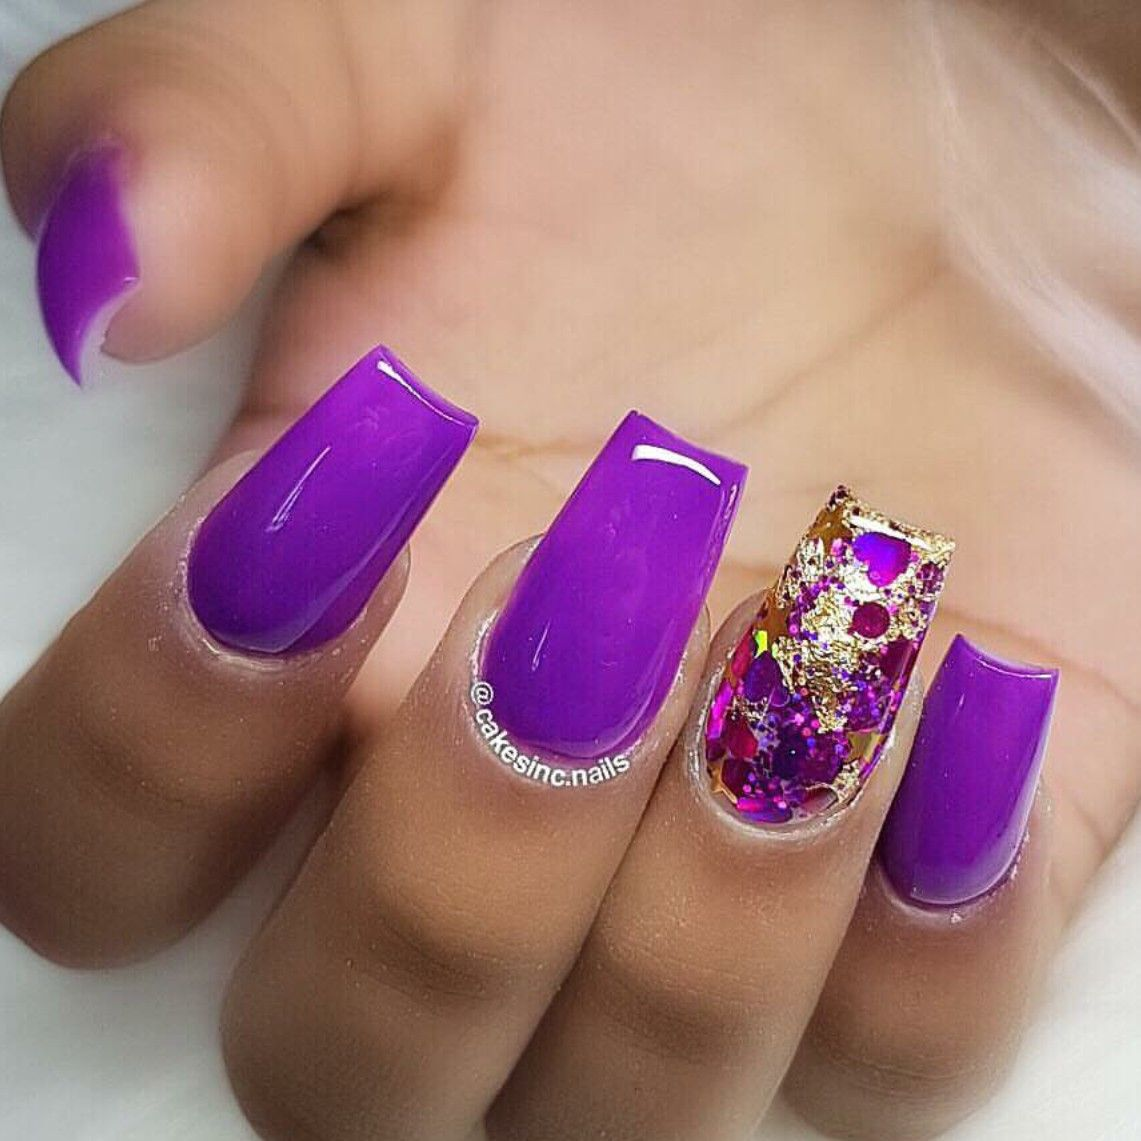 Neon Purple Nails Gold Glitter Nails Square Nails Acrylic Nails Summer Nails Purple Nails Gold Glitter Nails Neon Purple Nails